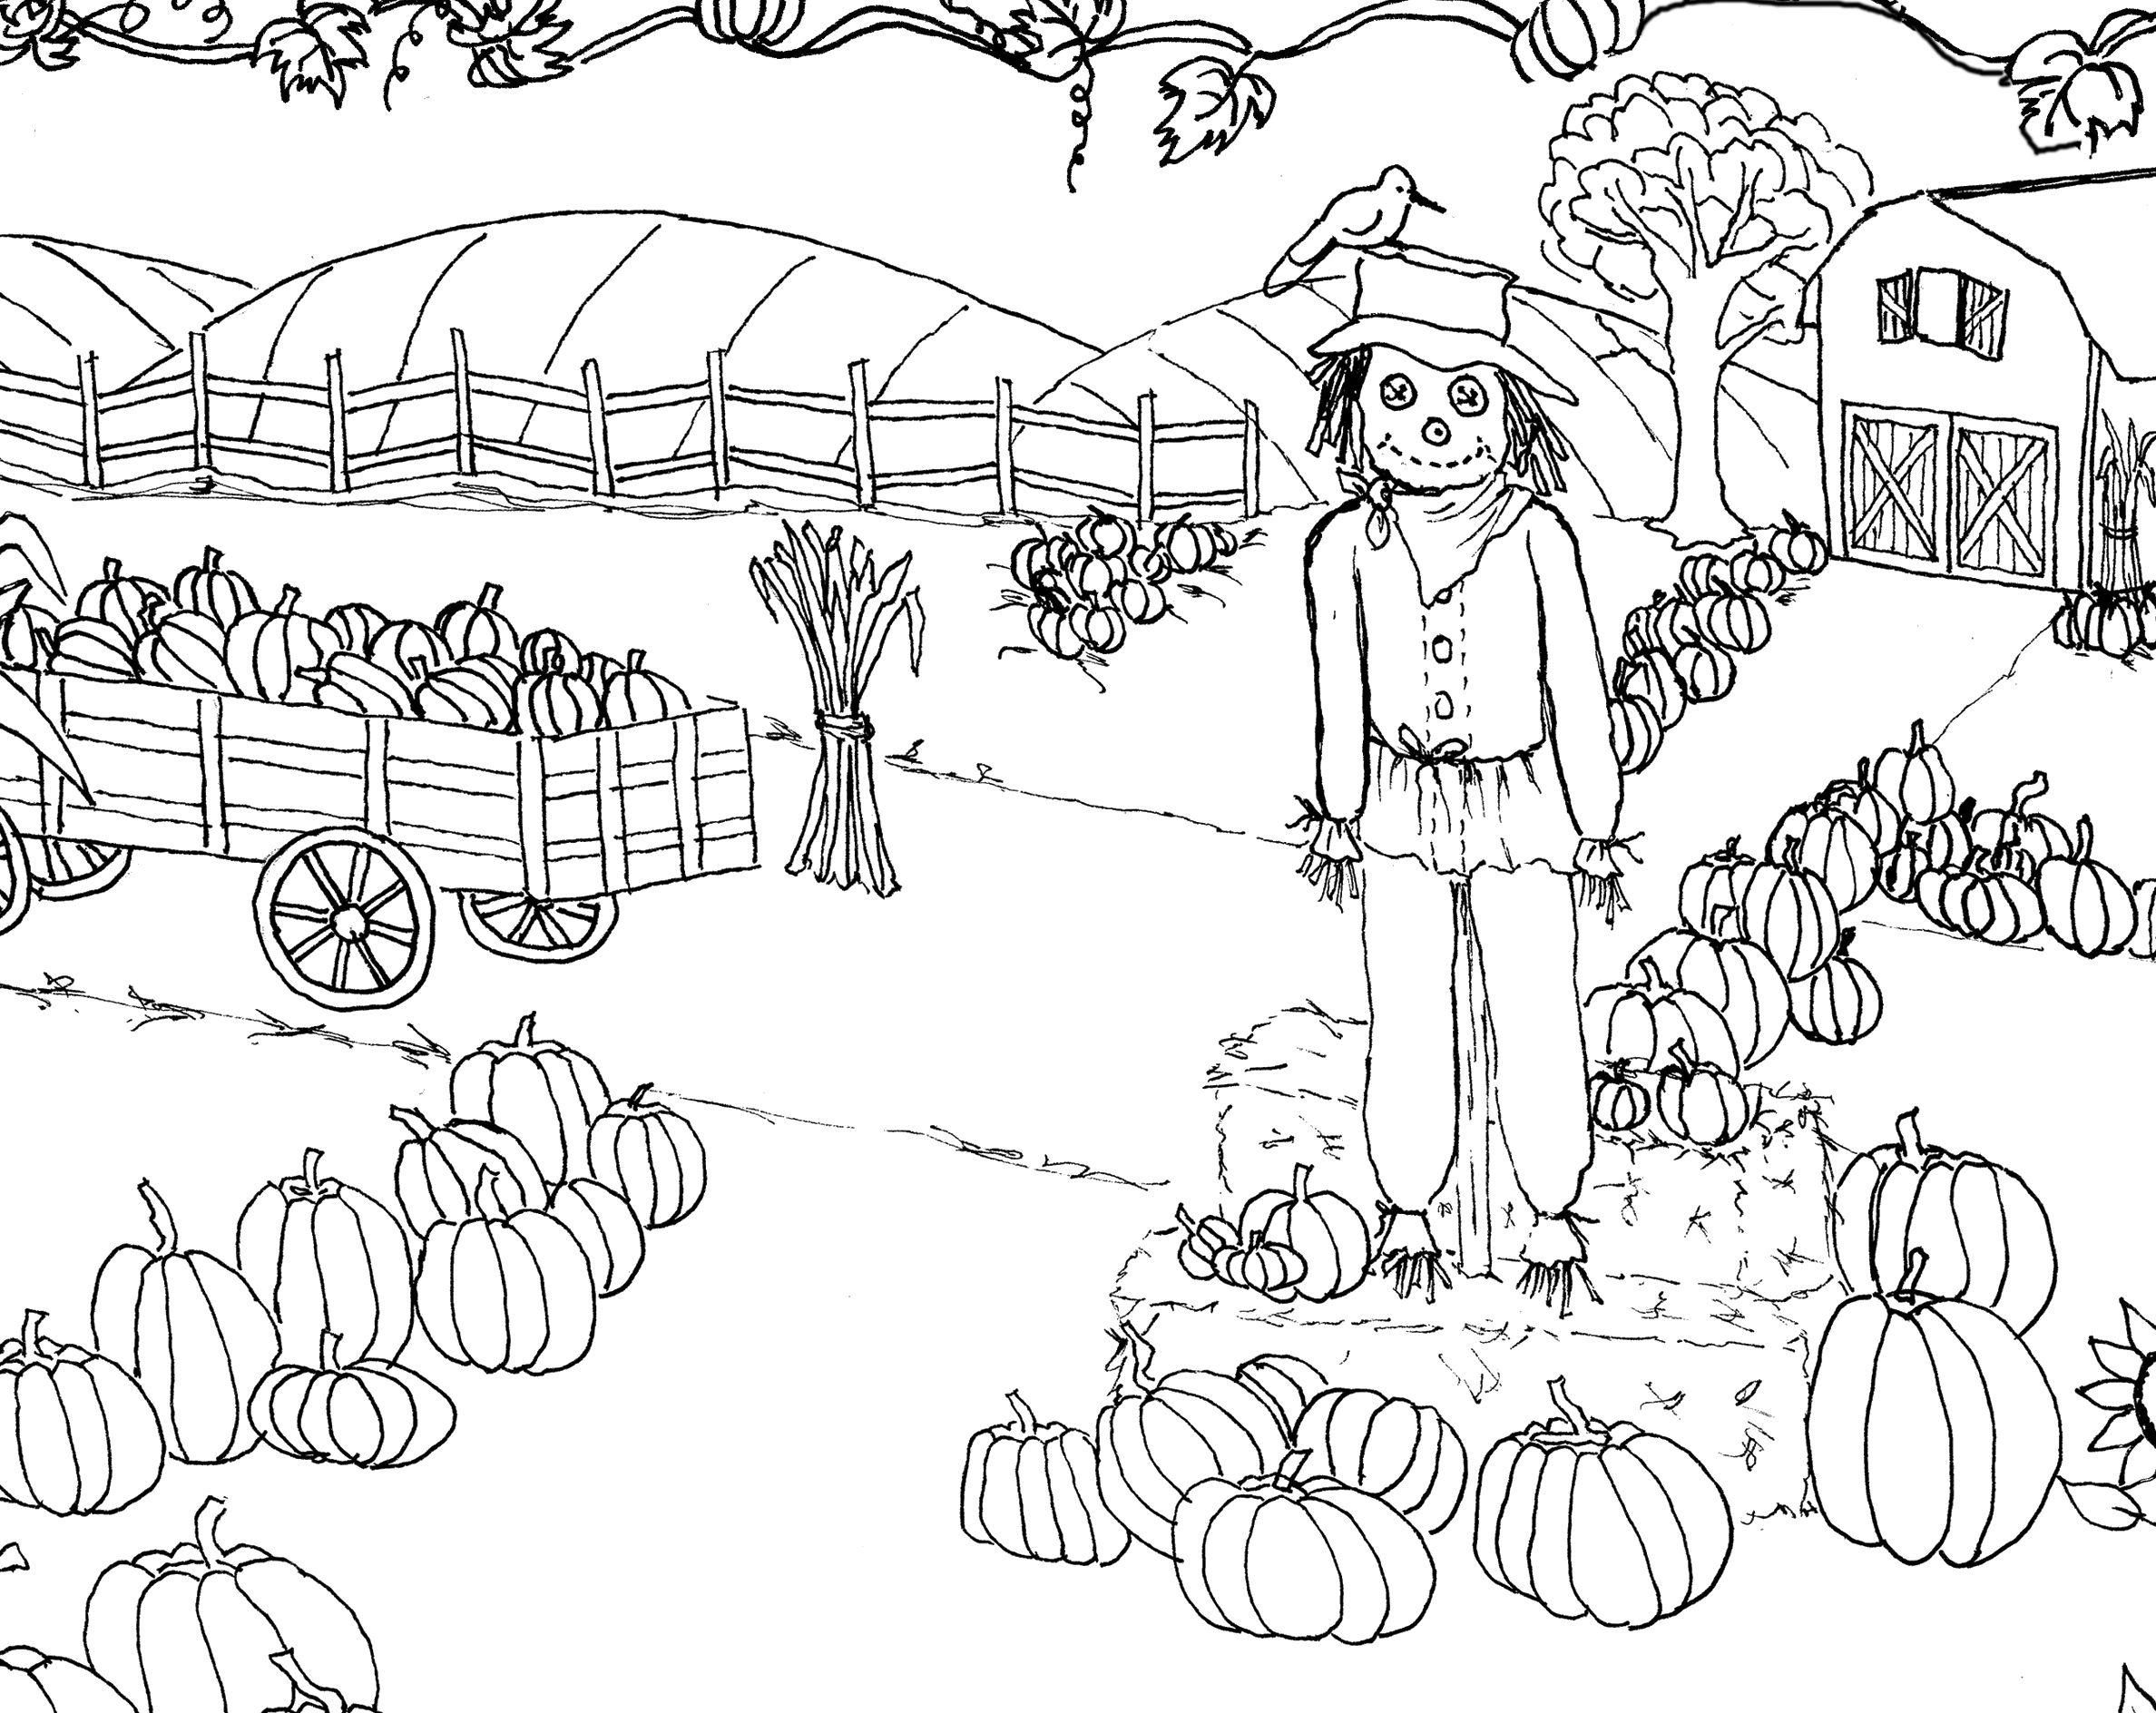 Pumpkin Patch Coloring Pages Zu9x Pumpkin Patch Coloring Page